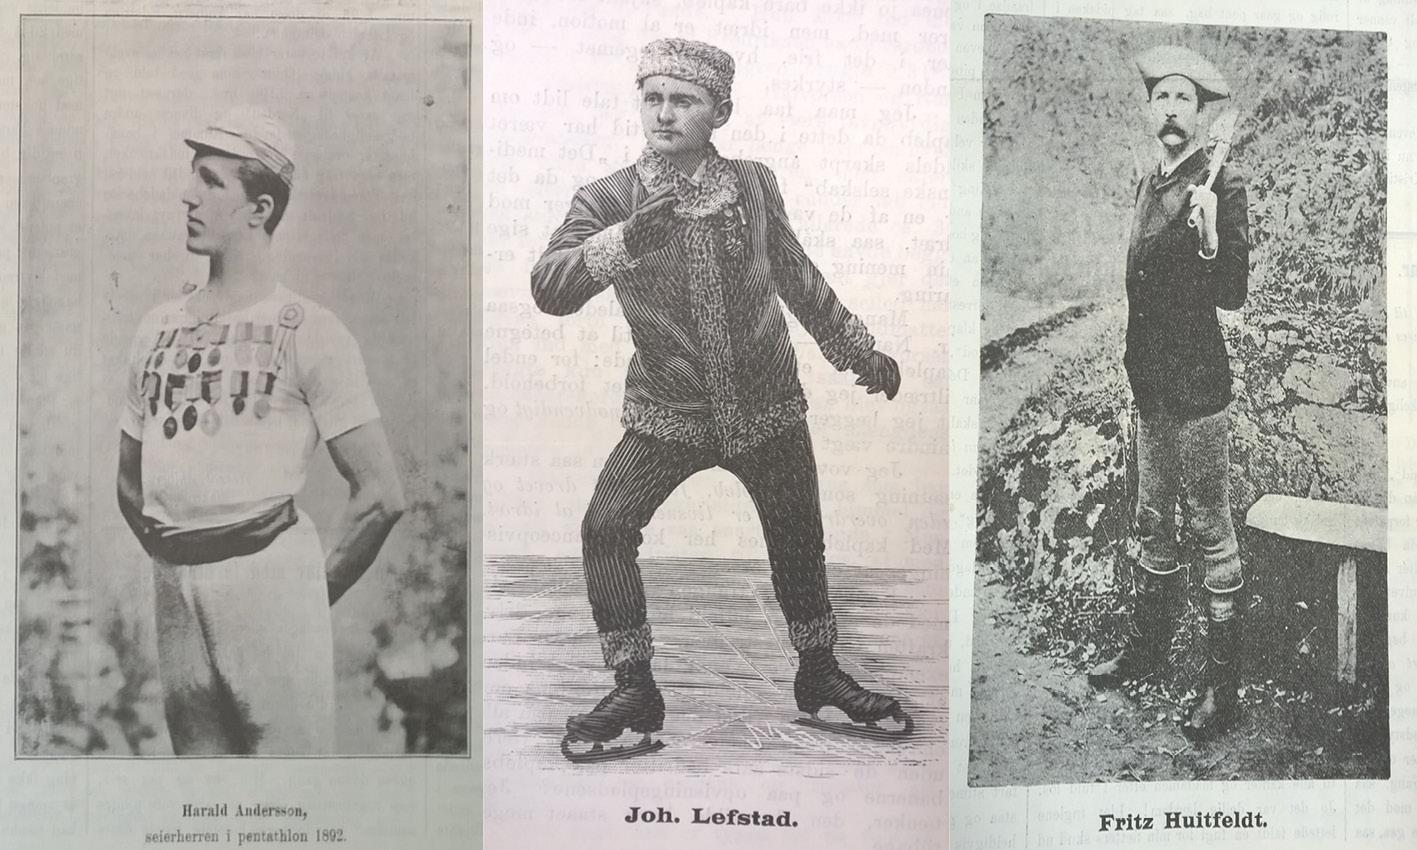 Harald Andersen, Johannes Lefstad, Fritz Huitfeldt